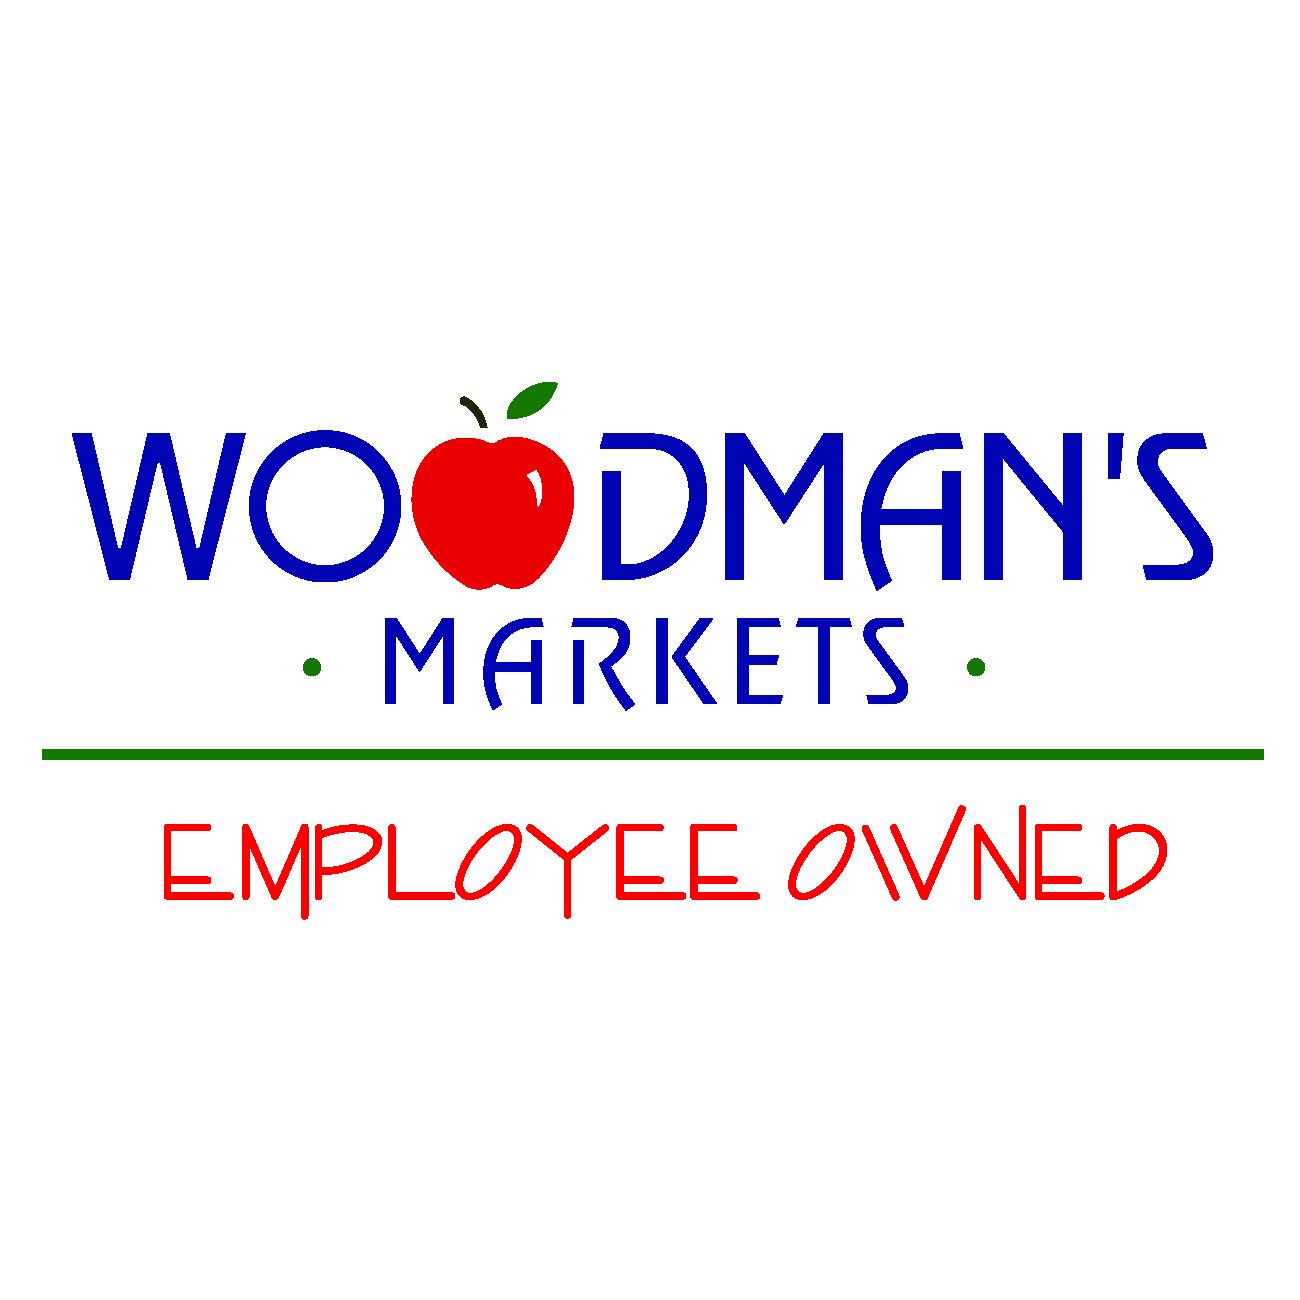 Woodman's Food Markets logo